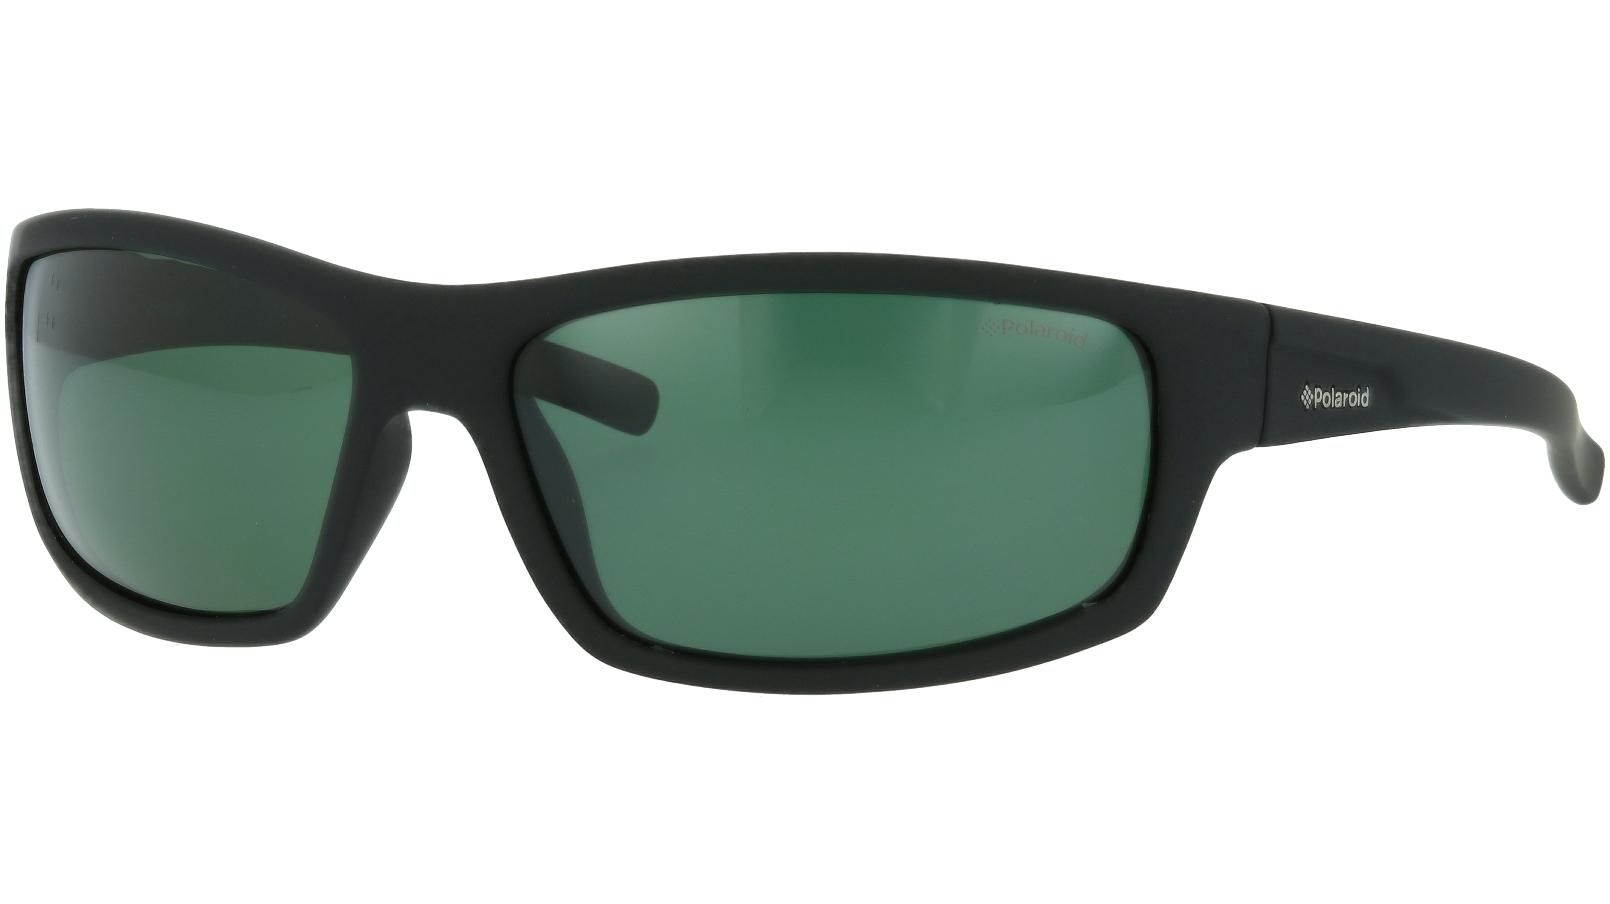 Polaroid P8411 9CARC 63 BLACK Sunglasses